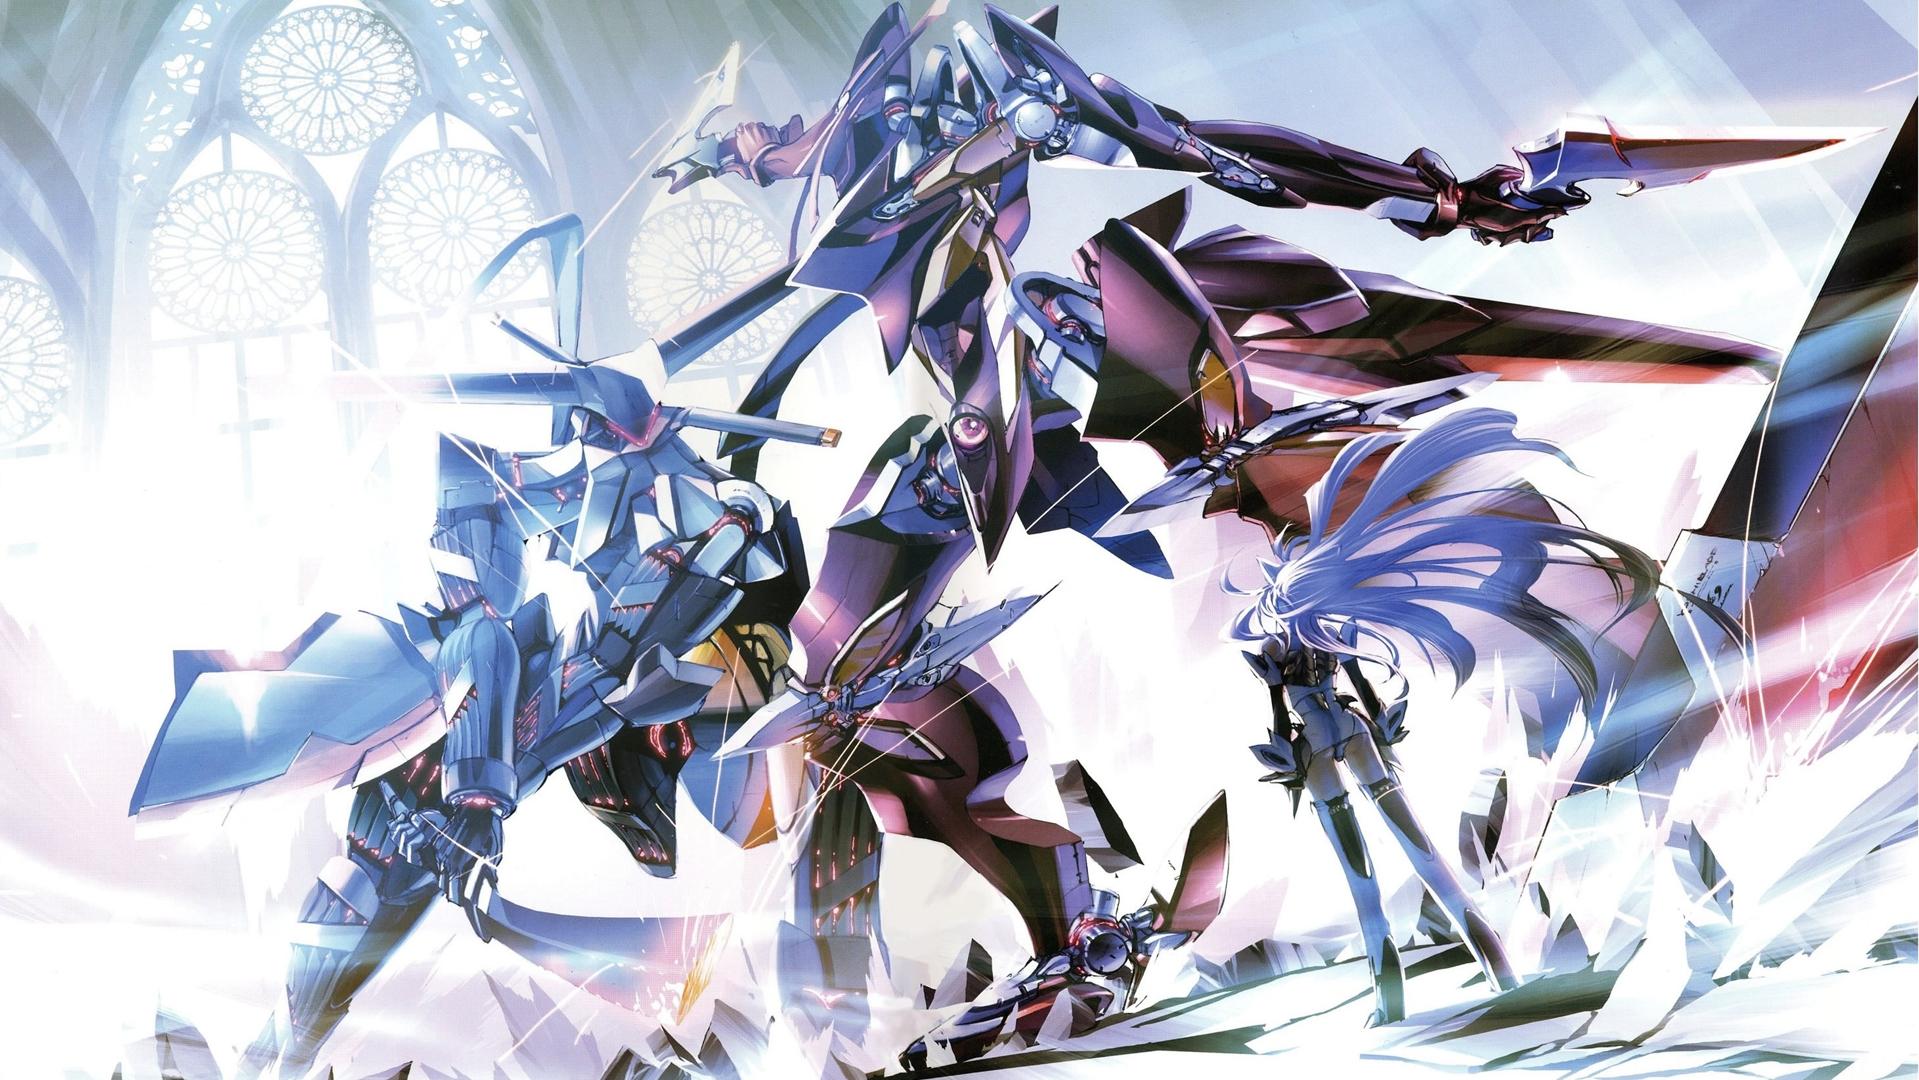 Epic Anime Wallpaper HD - WallpaperSafari